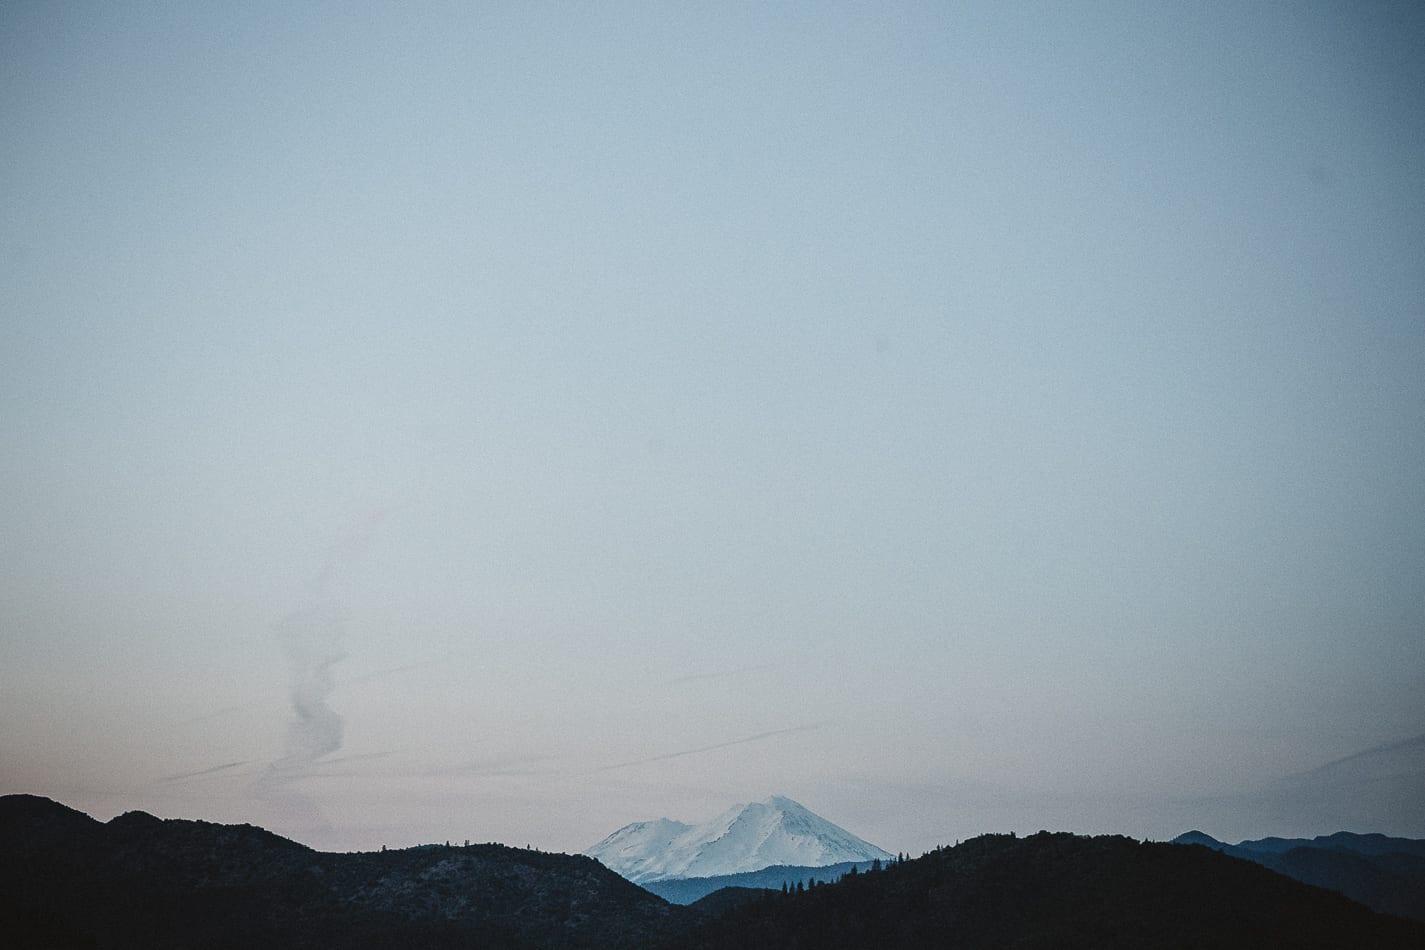 shasta-dam-california-lifestyle-portrait-photographer-7